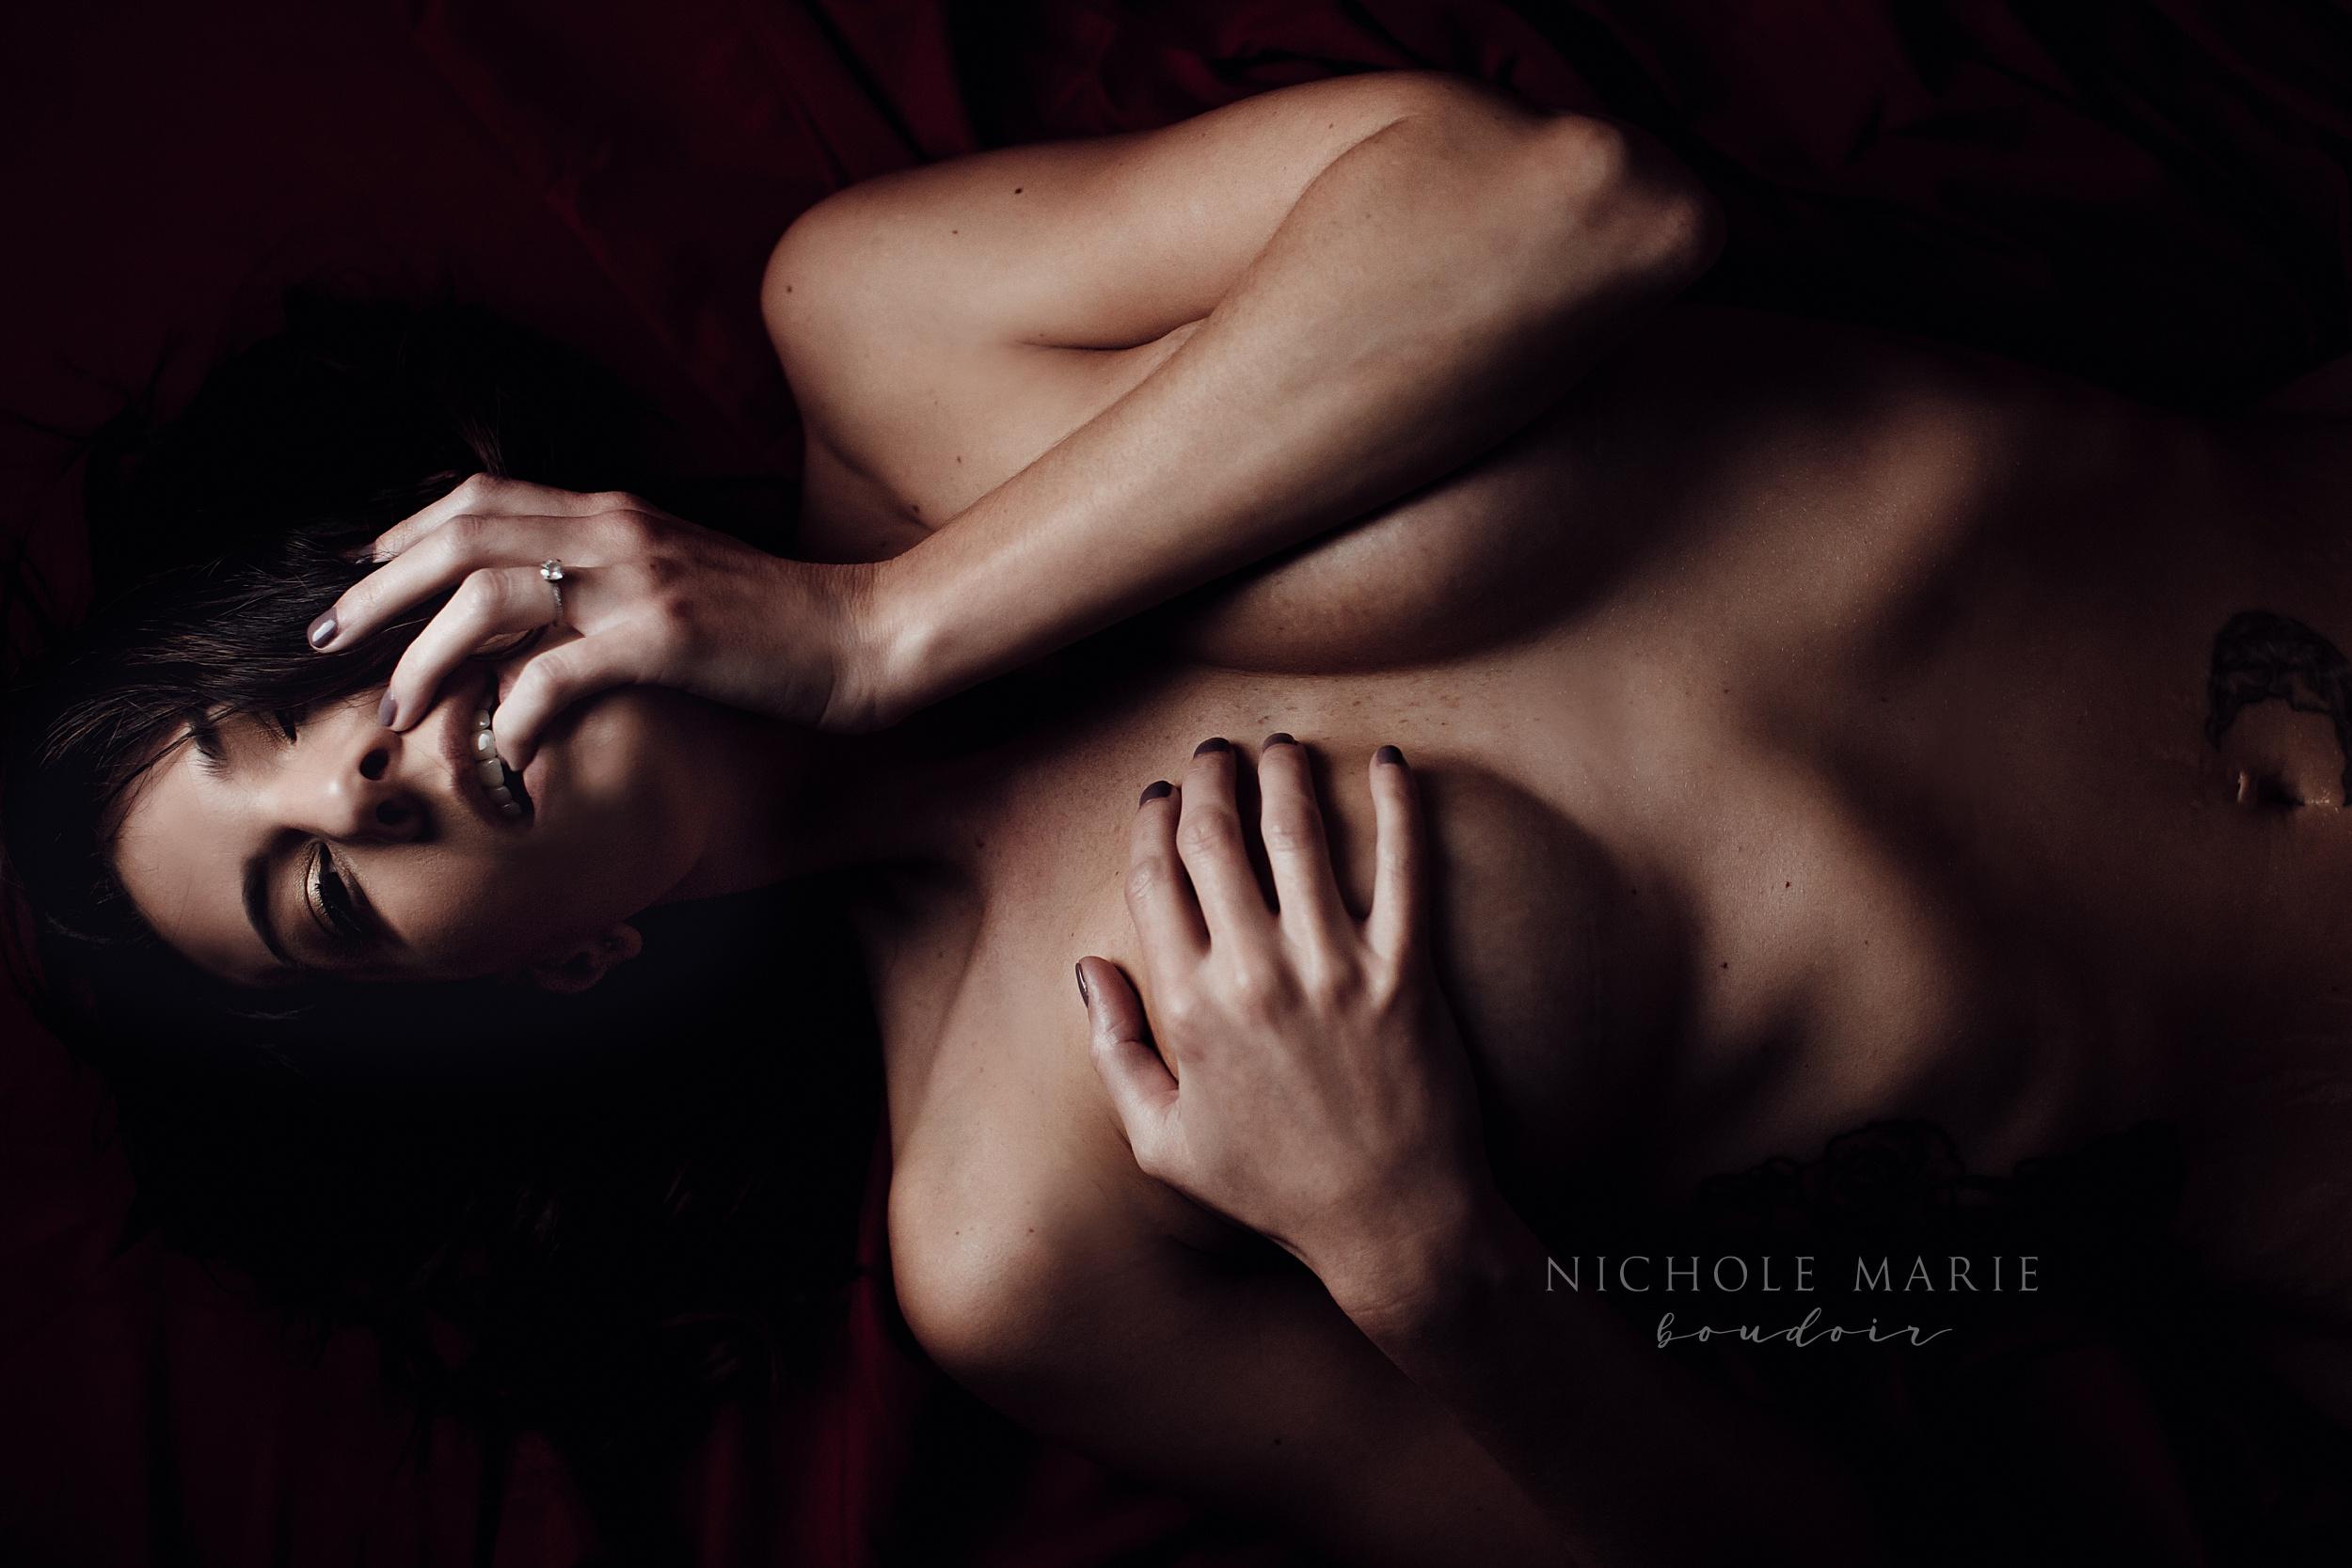 Finger bite boudoir shot | Sebastian, Florida Boudoir Photographer | Nichole Maire Boudoir.jpg